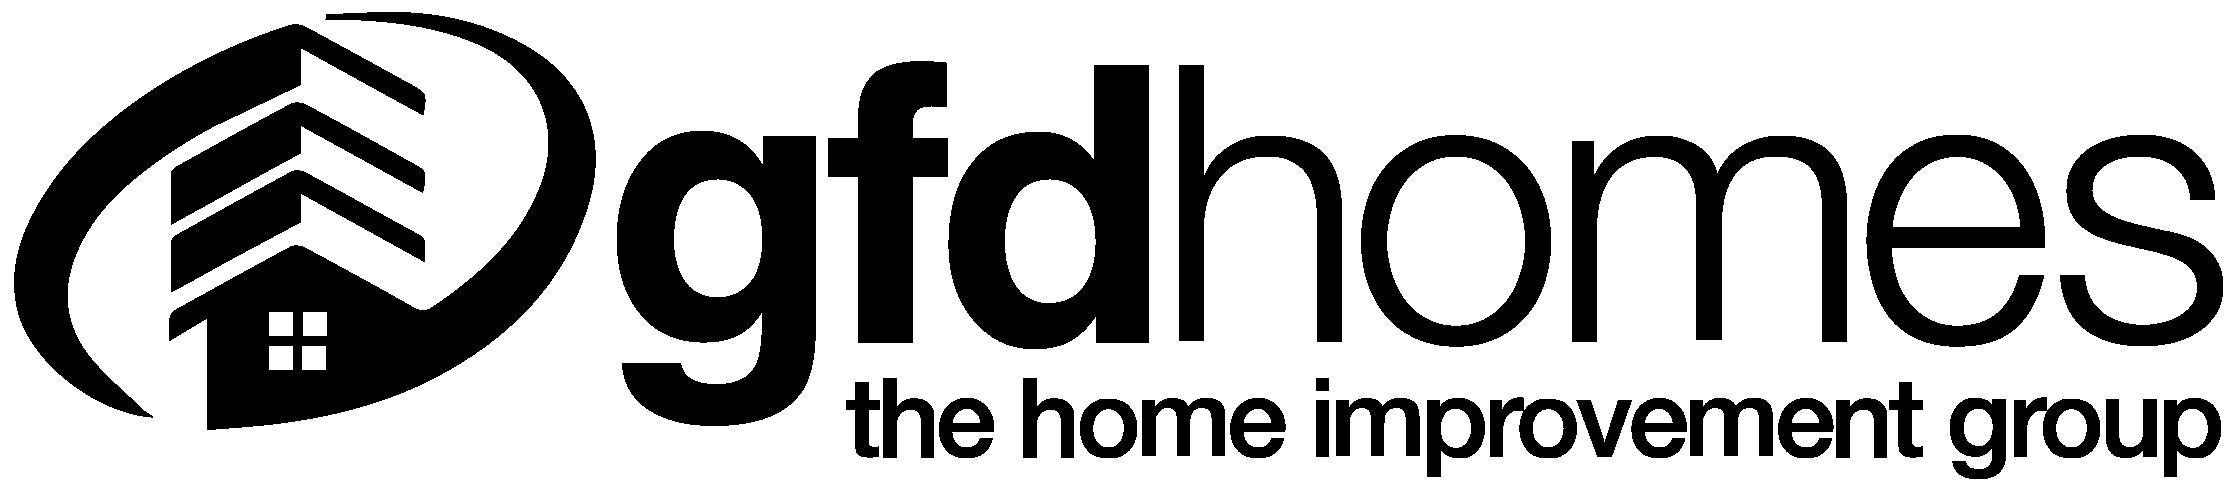 GFD Homes